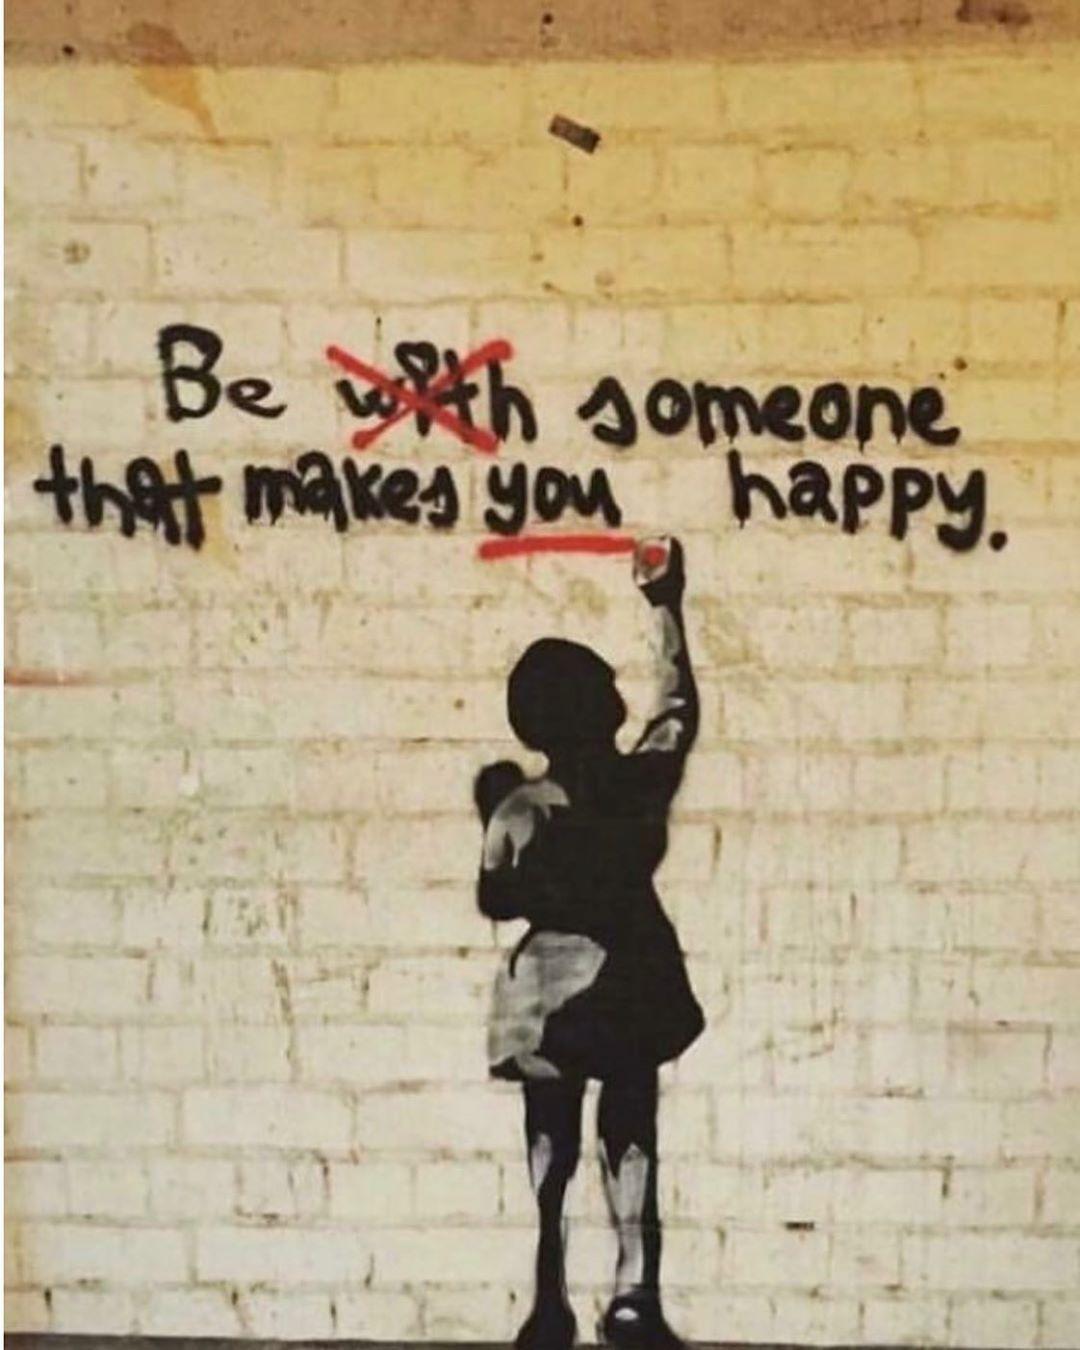 "chris henn on Instagram: ""Banksy ❤️ #banksy #streetart #art #emotions #graffiti #urbanart #stencil #artwork #streetartglobe #sprayart #banksyart #artsy #sad…"""